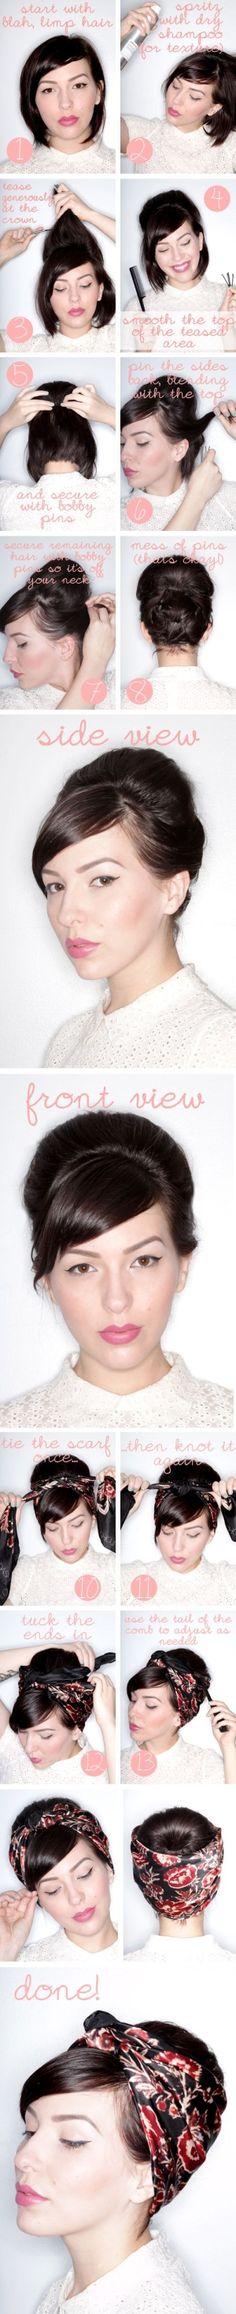 Faux Updo Tutorial For Short bob Hair by Graybird